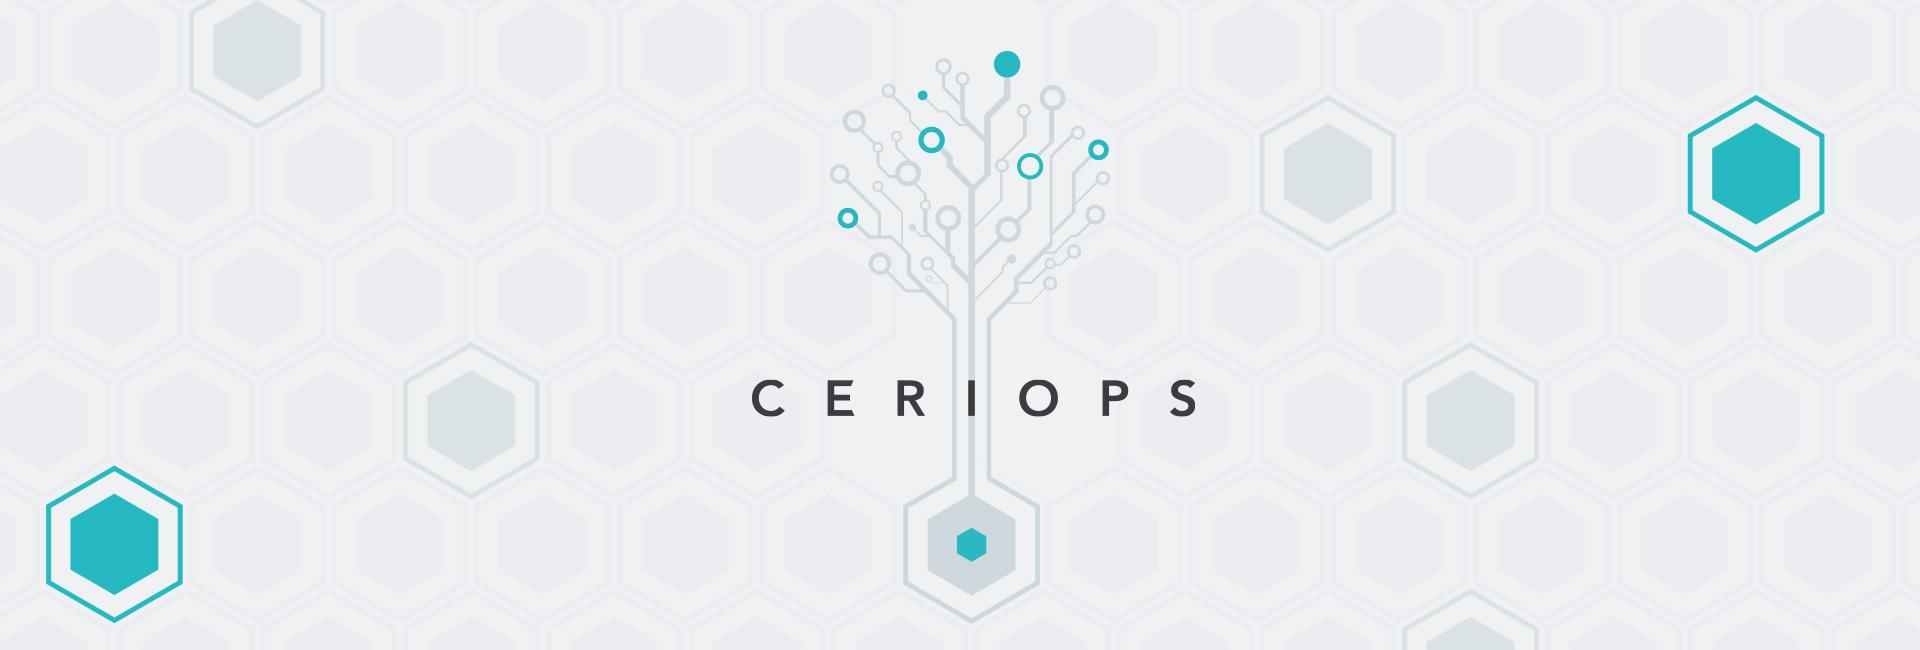 ceriops-solutions-industrie-agile-slider-01